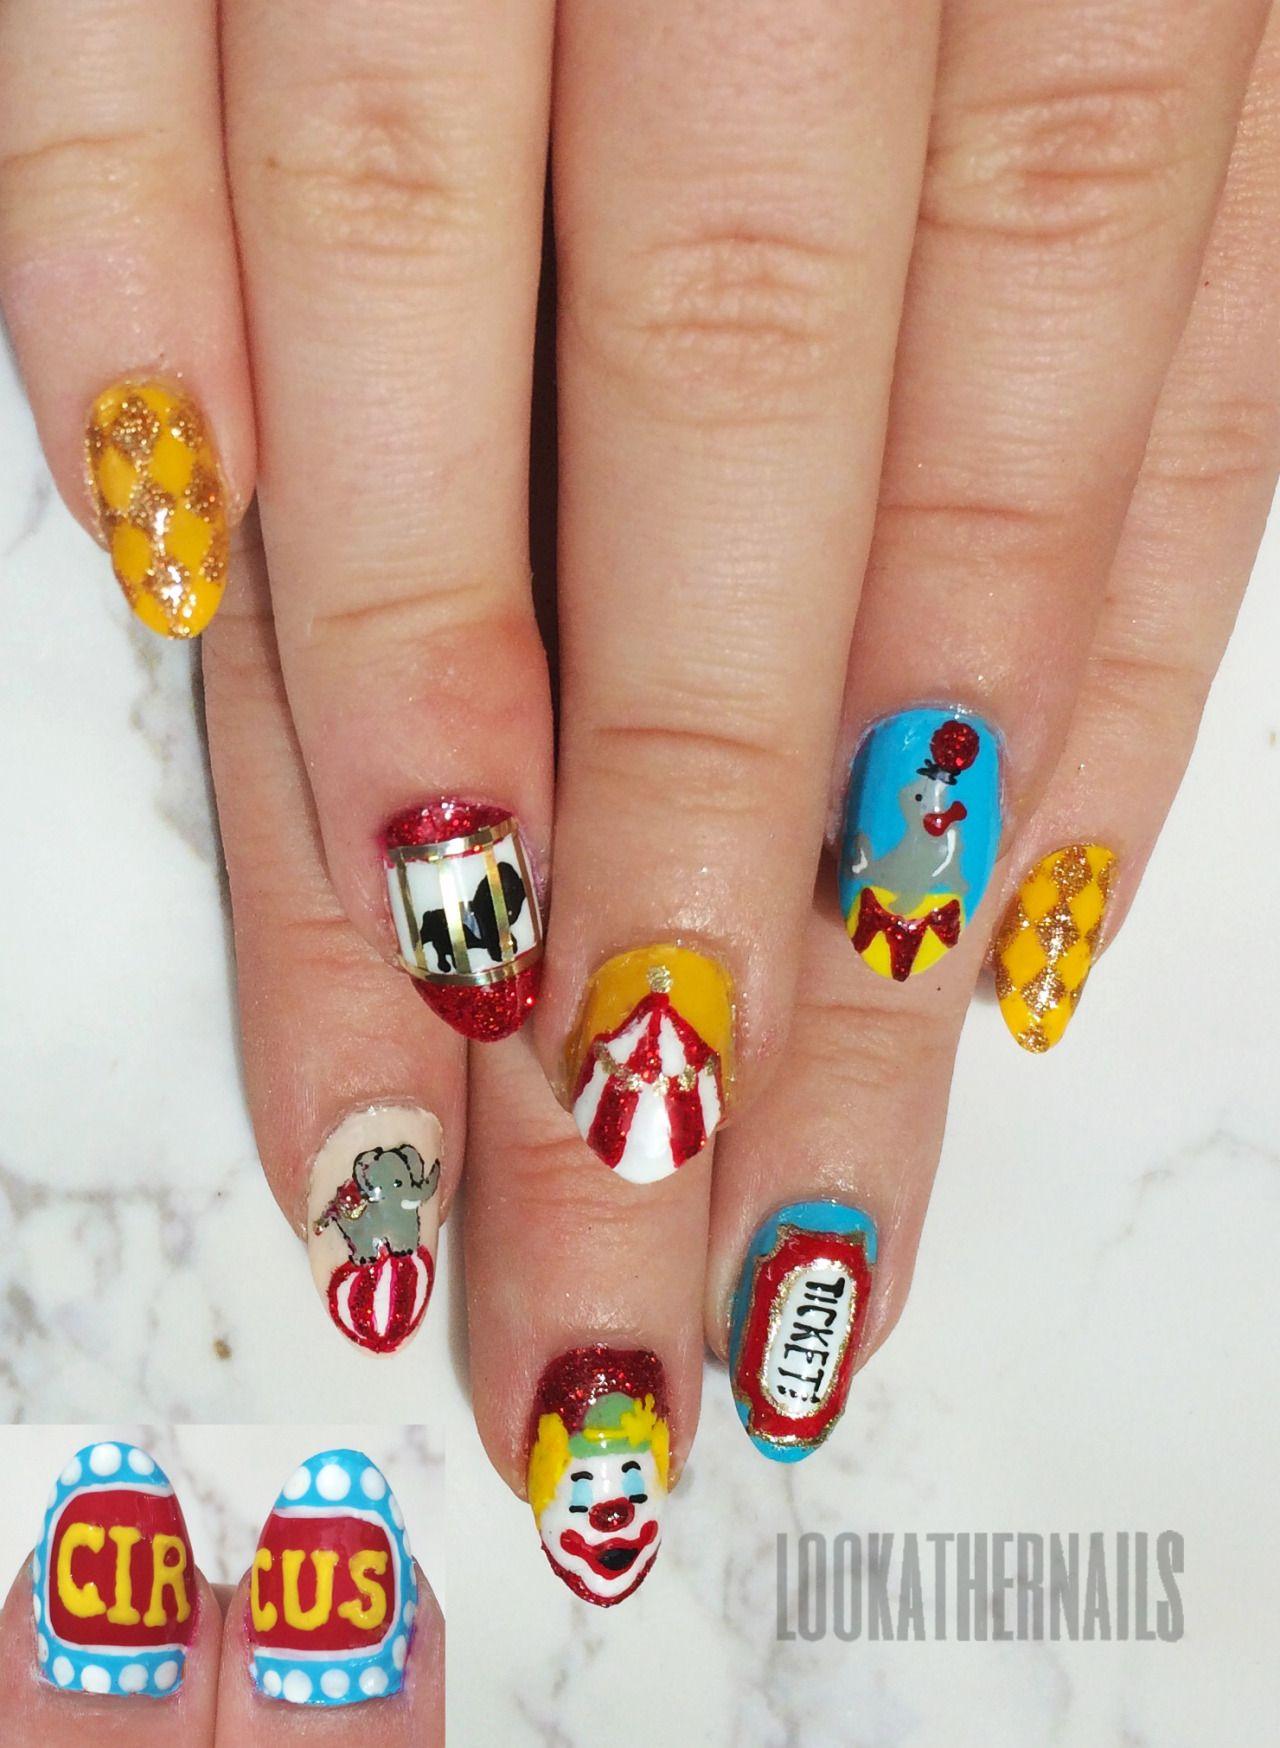 Circus carnival nail art by lookathernails look at her nails circus carnival nail art by lookathernails prinsesfo Images